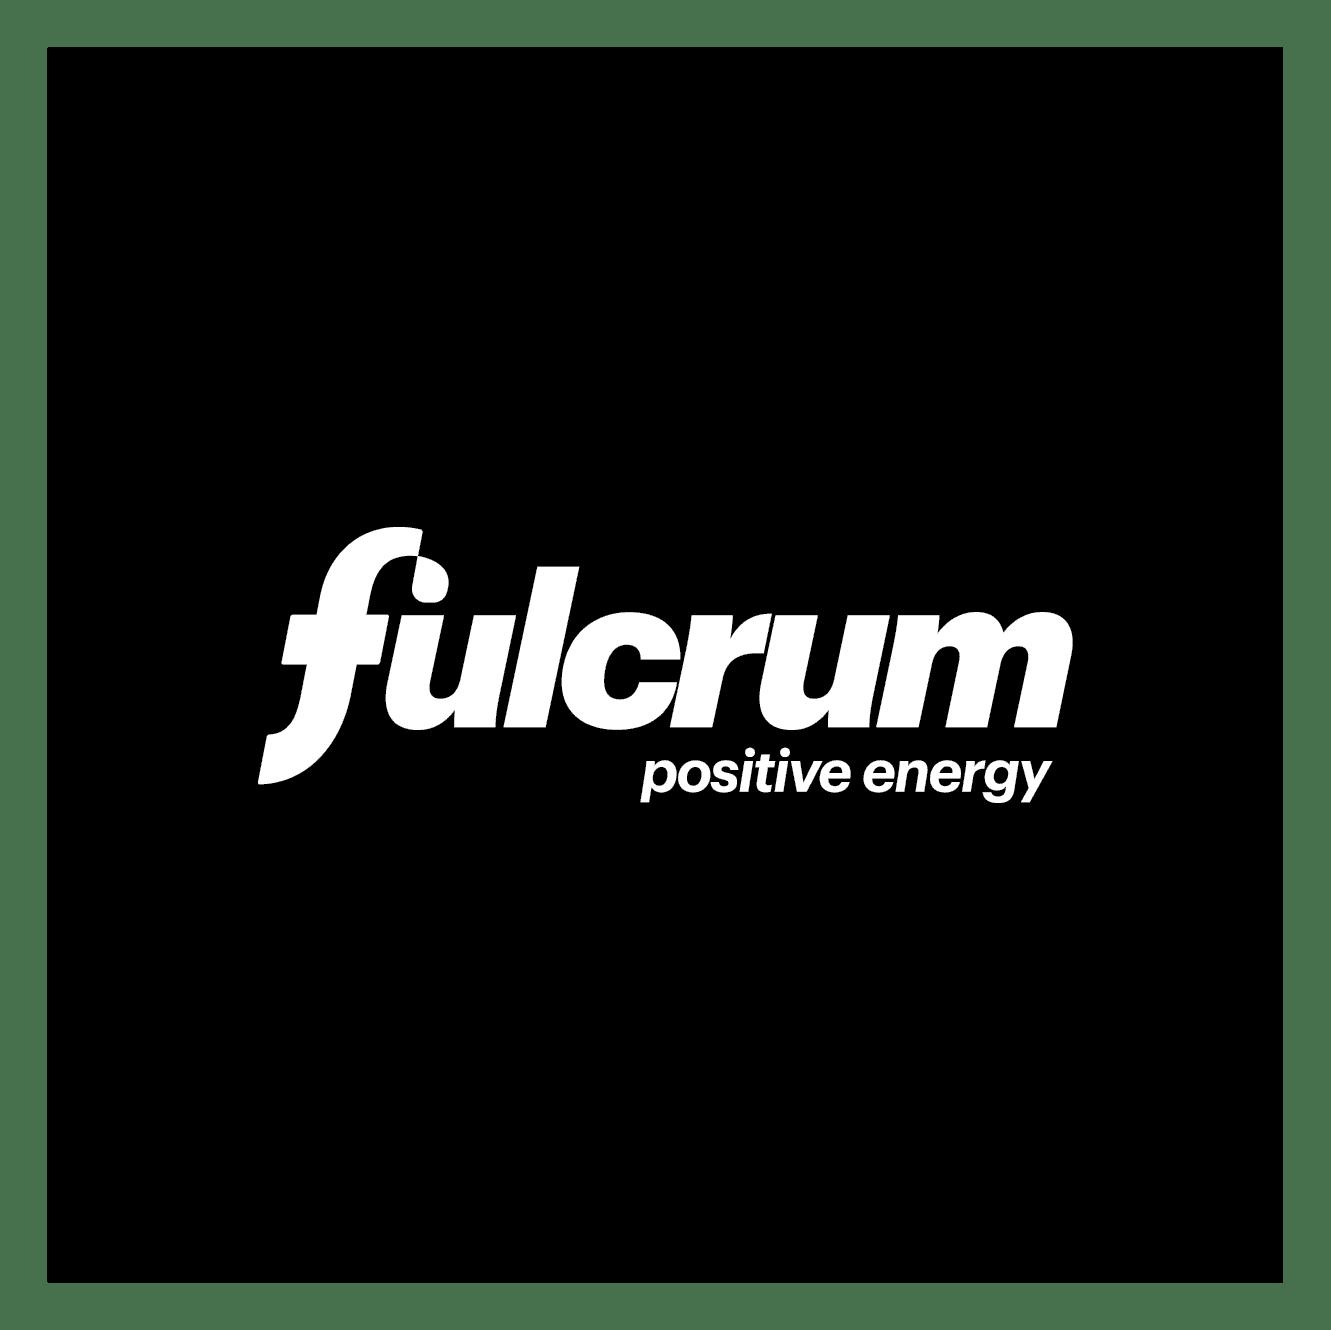 fulcrum_logosinitialselects_020419-67